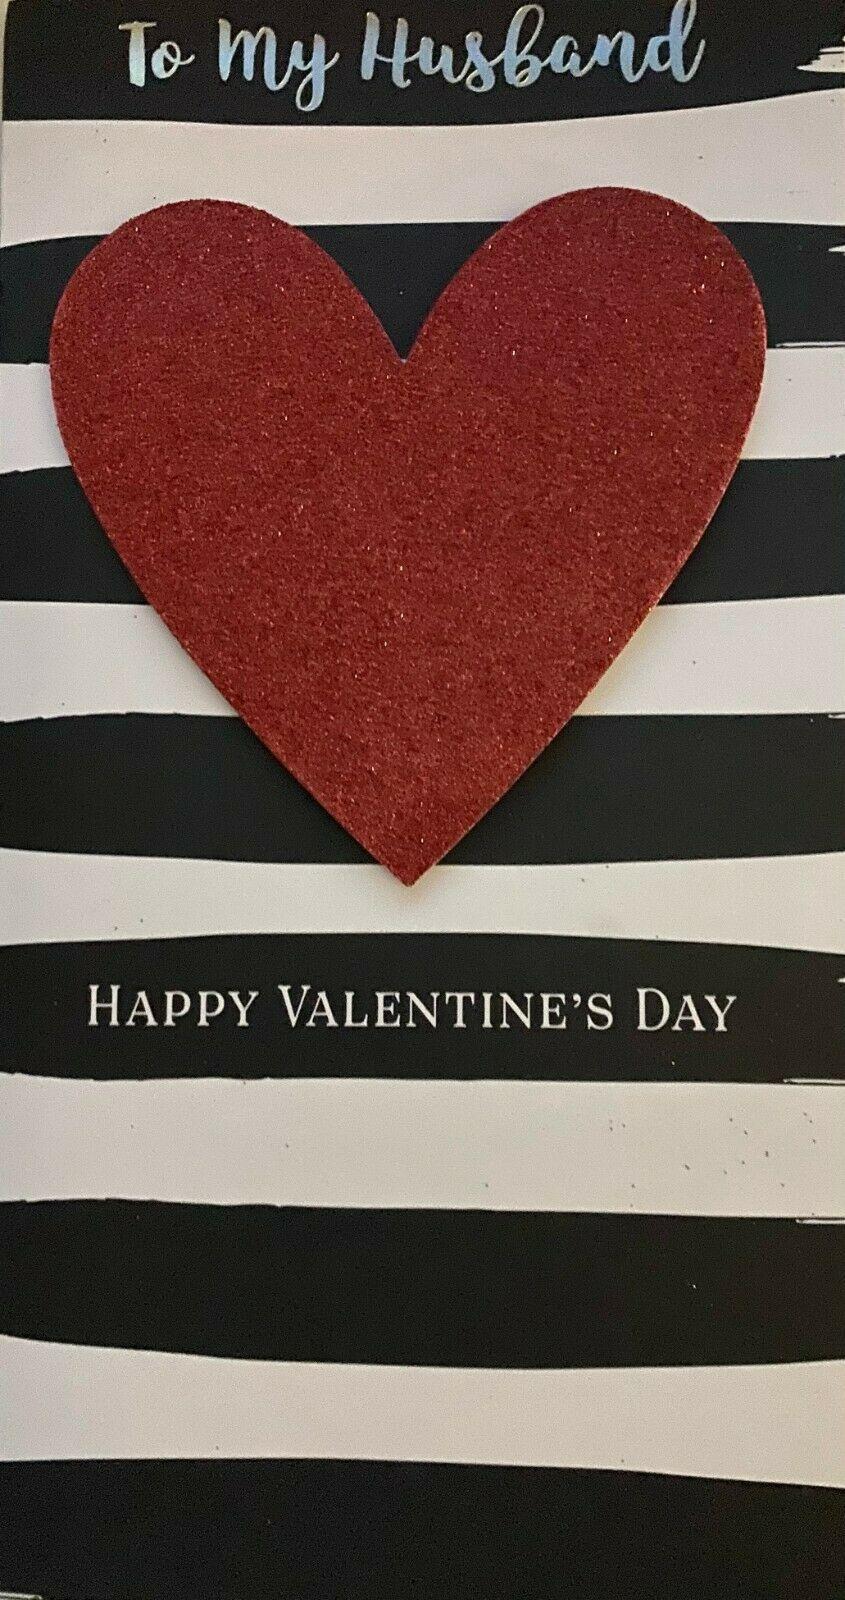 Valentine's Day Card To My Husband - Happy Valentine's Day